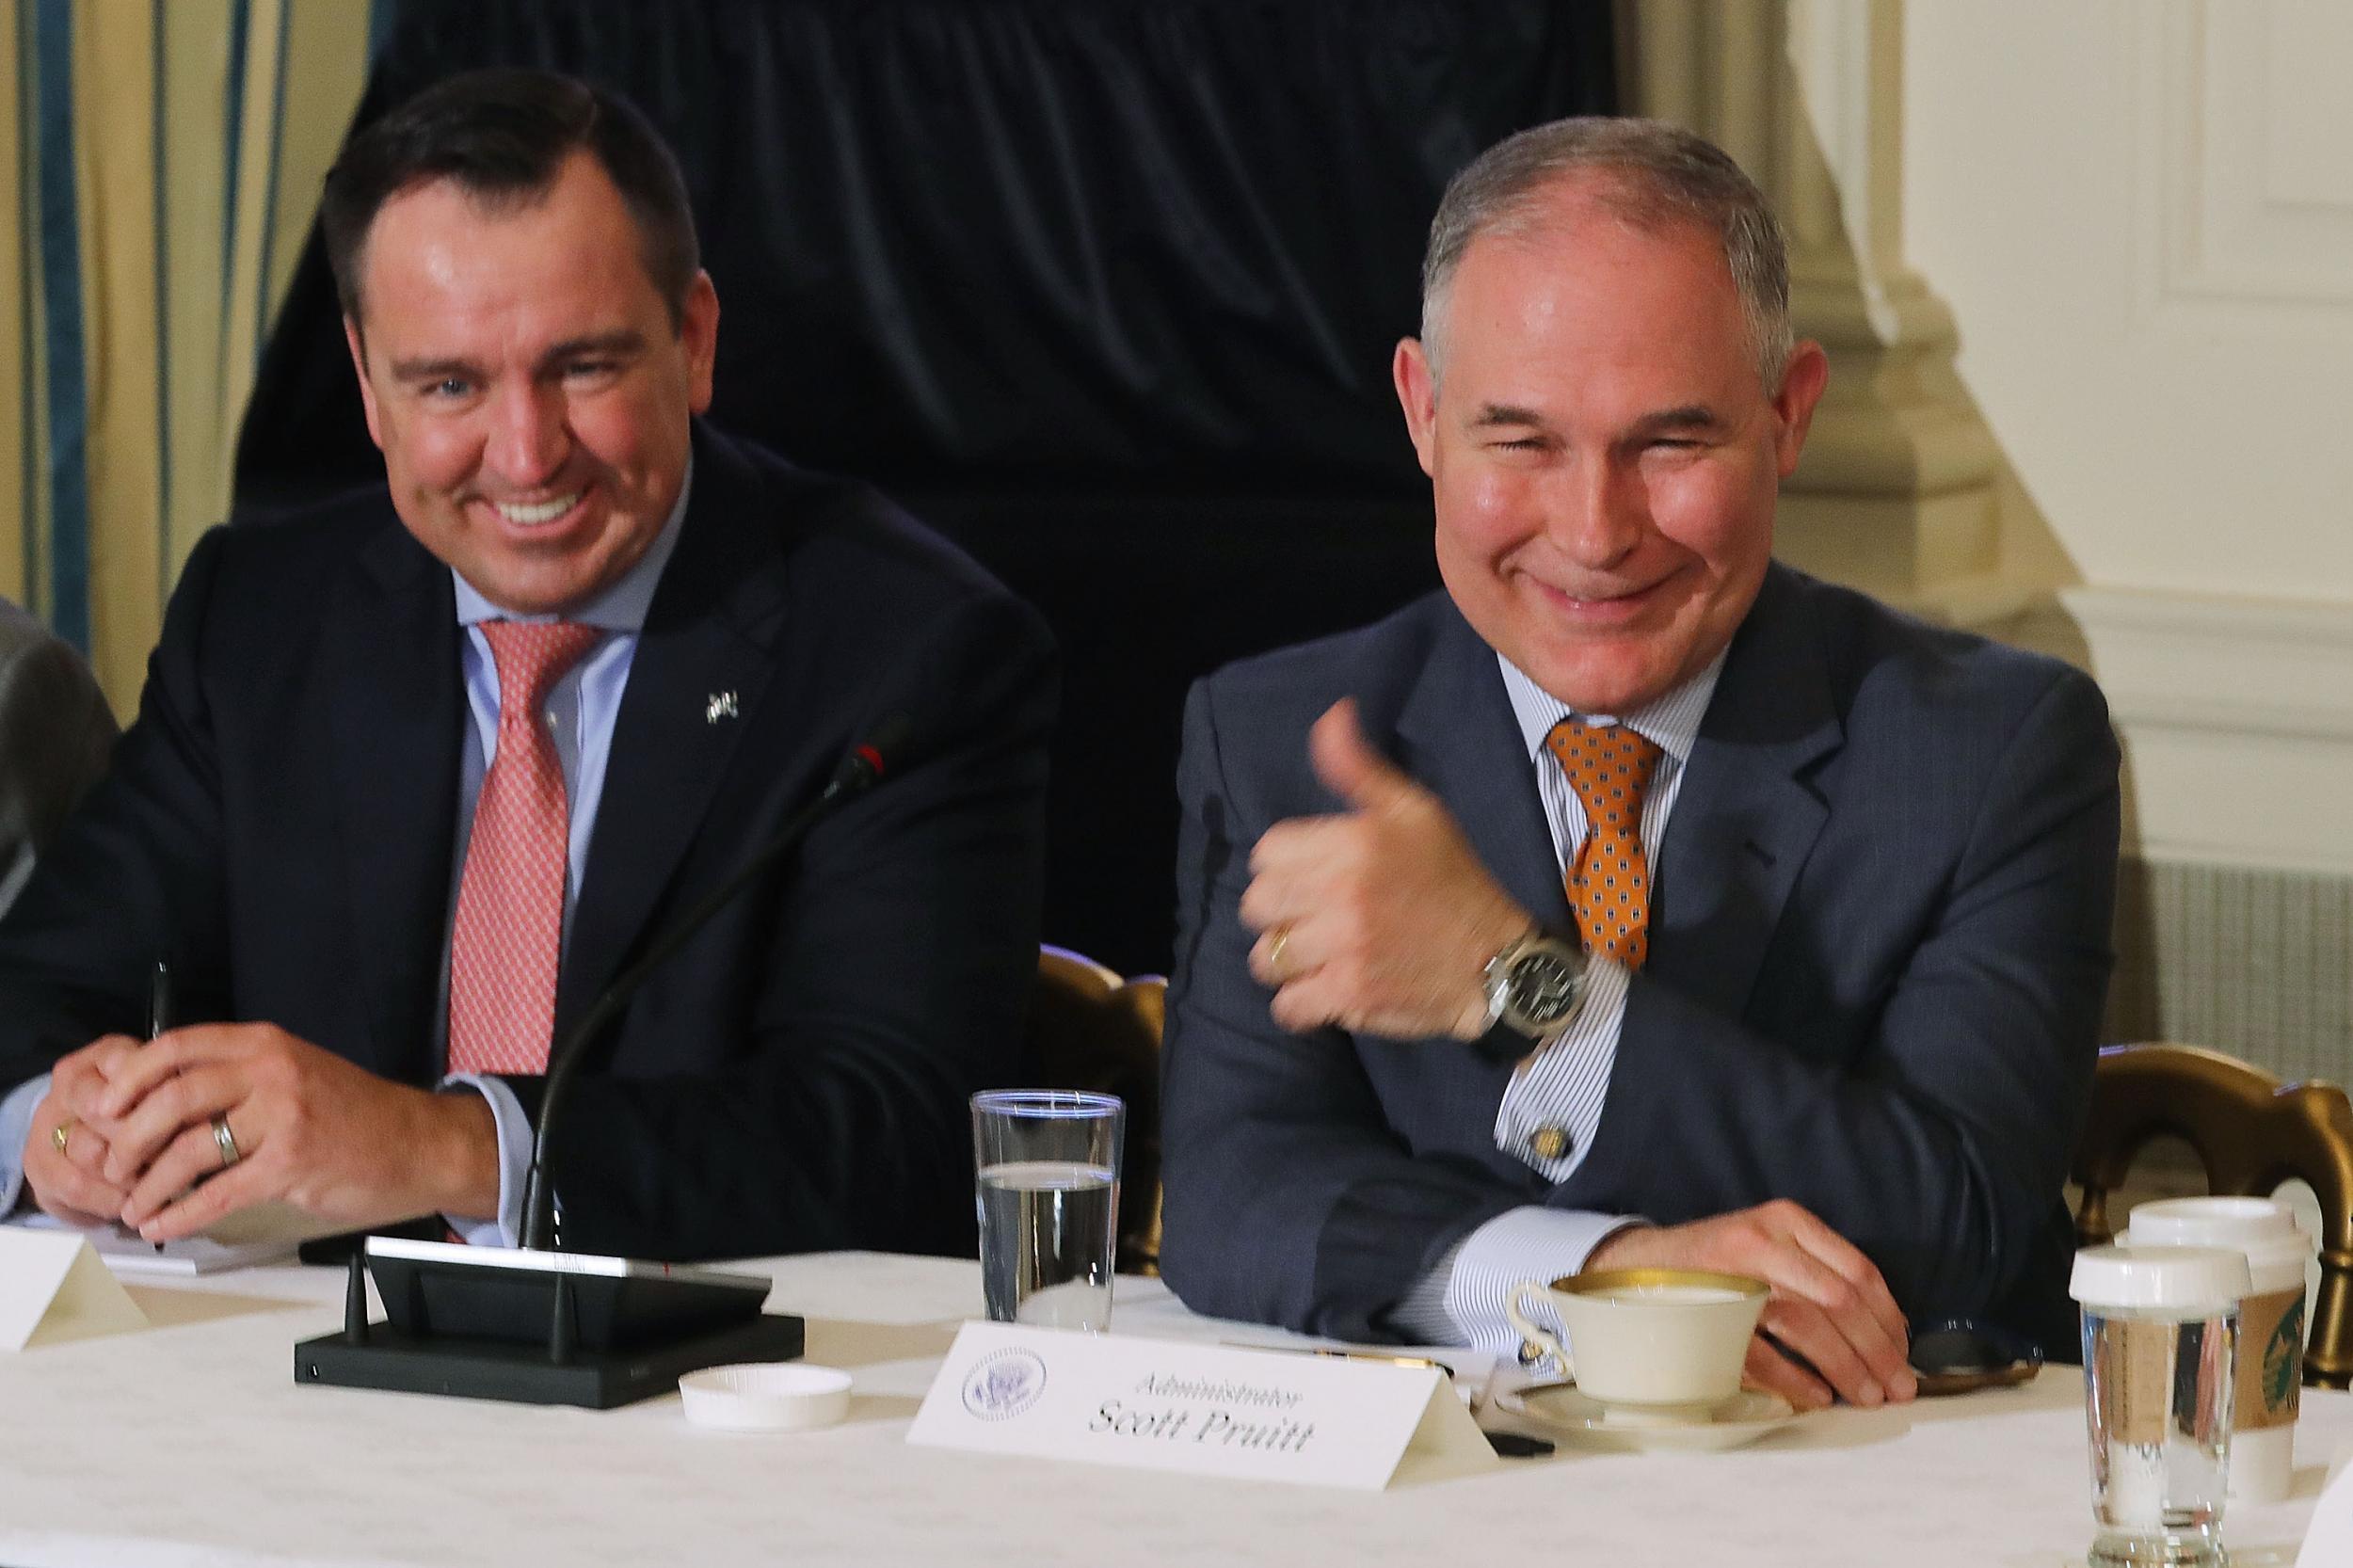 An EPA scientific committee hasn't met in 6 months because of a paperwork error